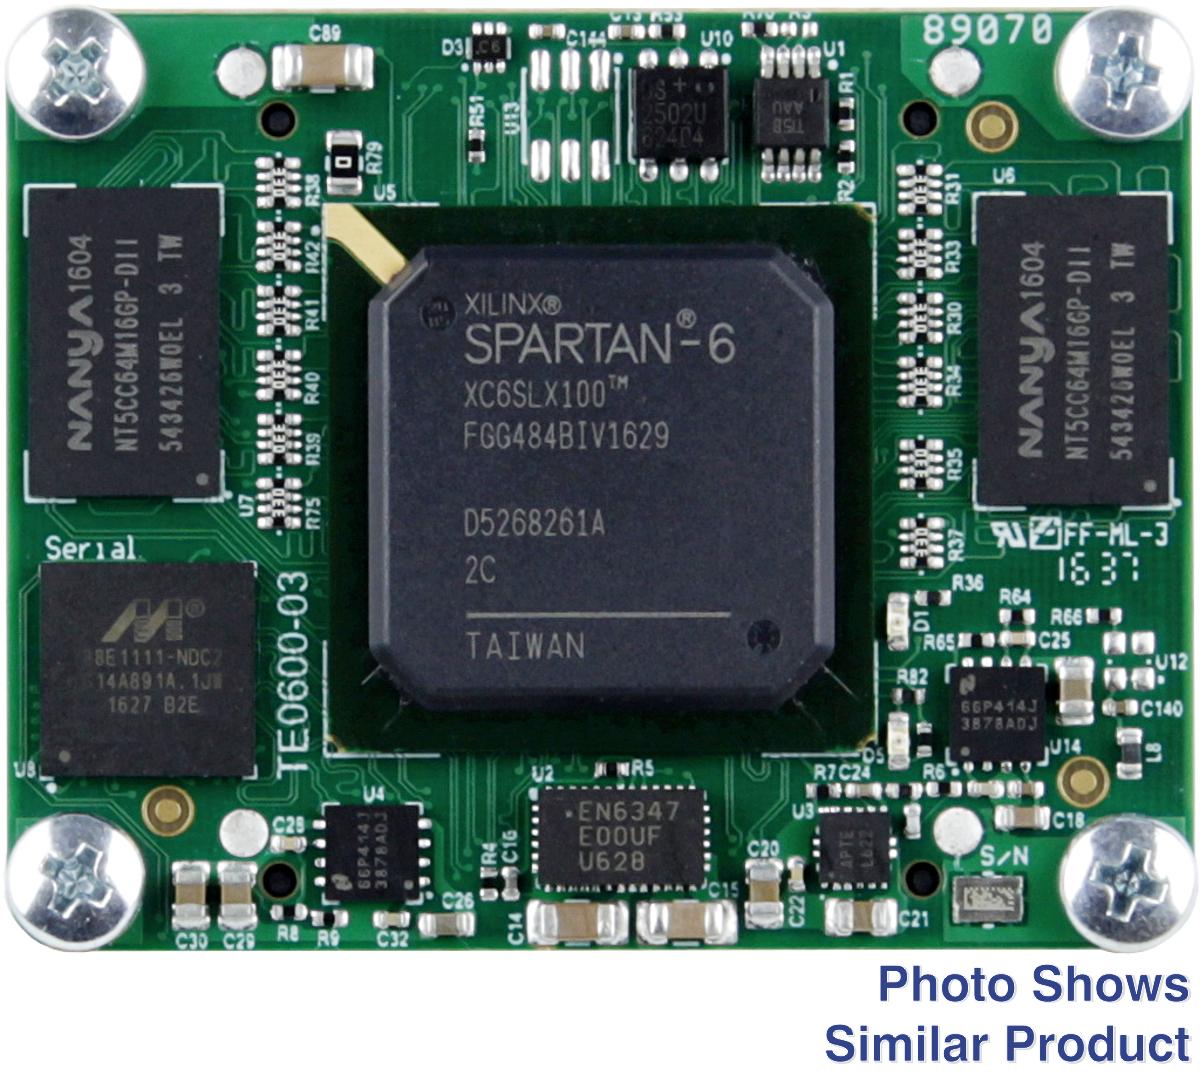 GigaBee XC6SLX150-3, 2 x 512 MByte SDRAM, industrial temperature range